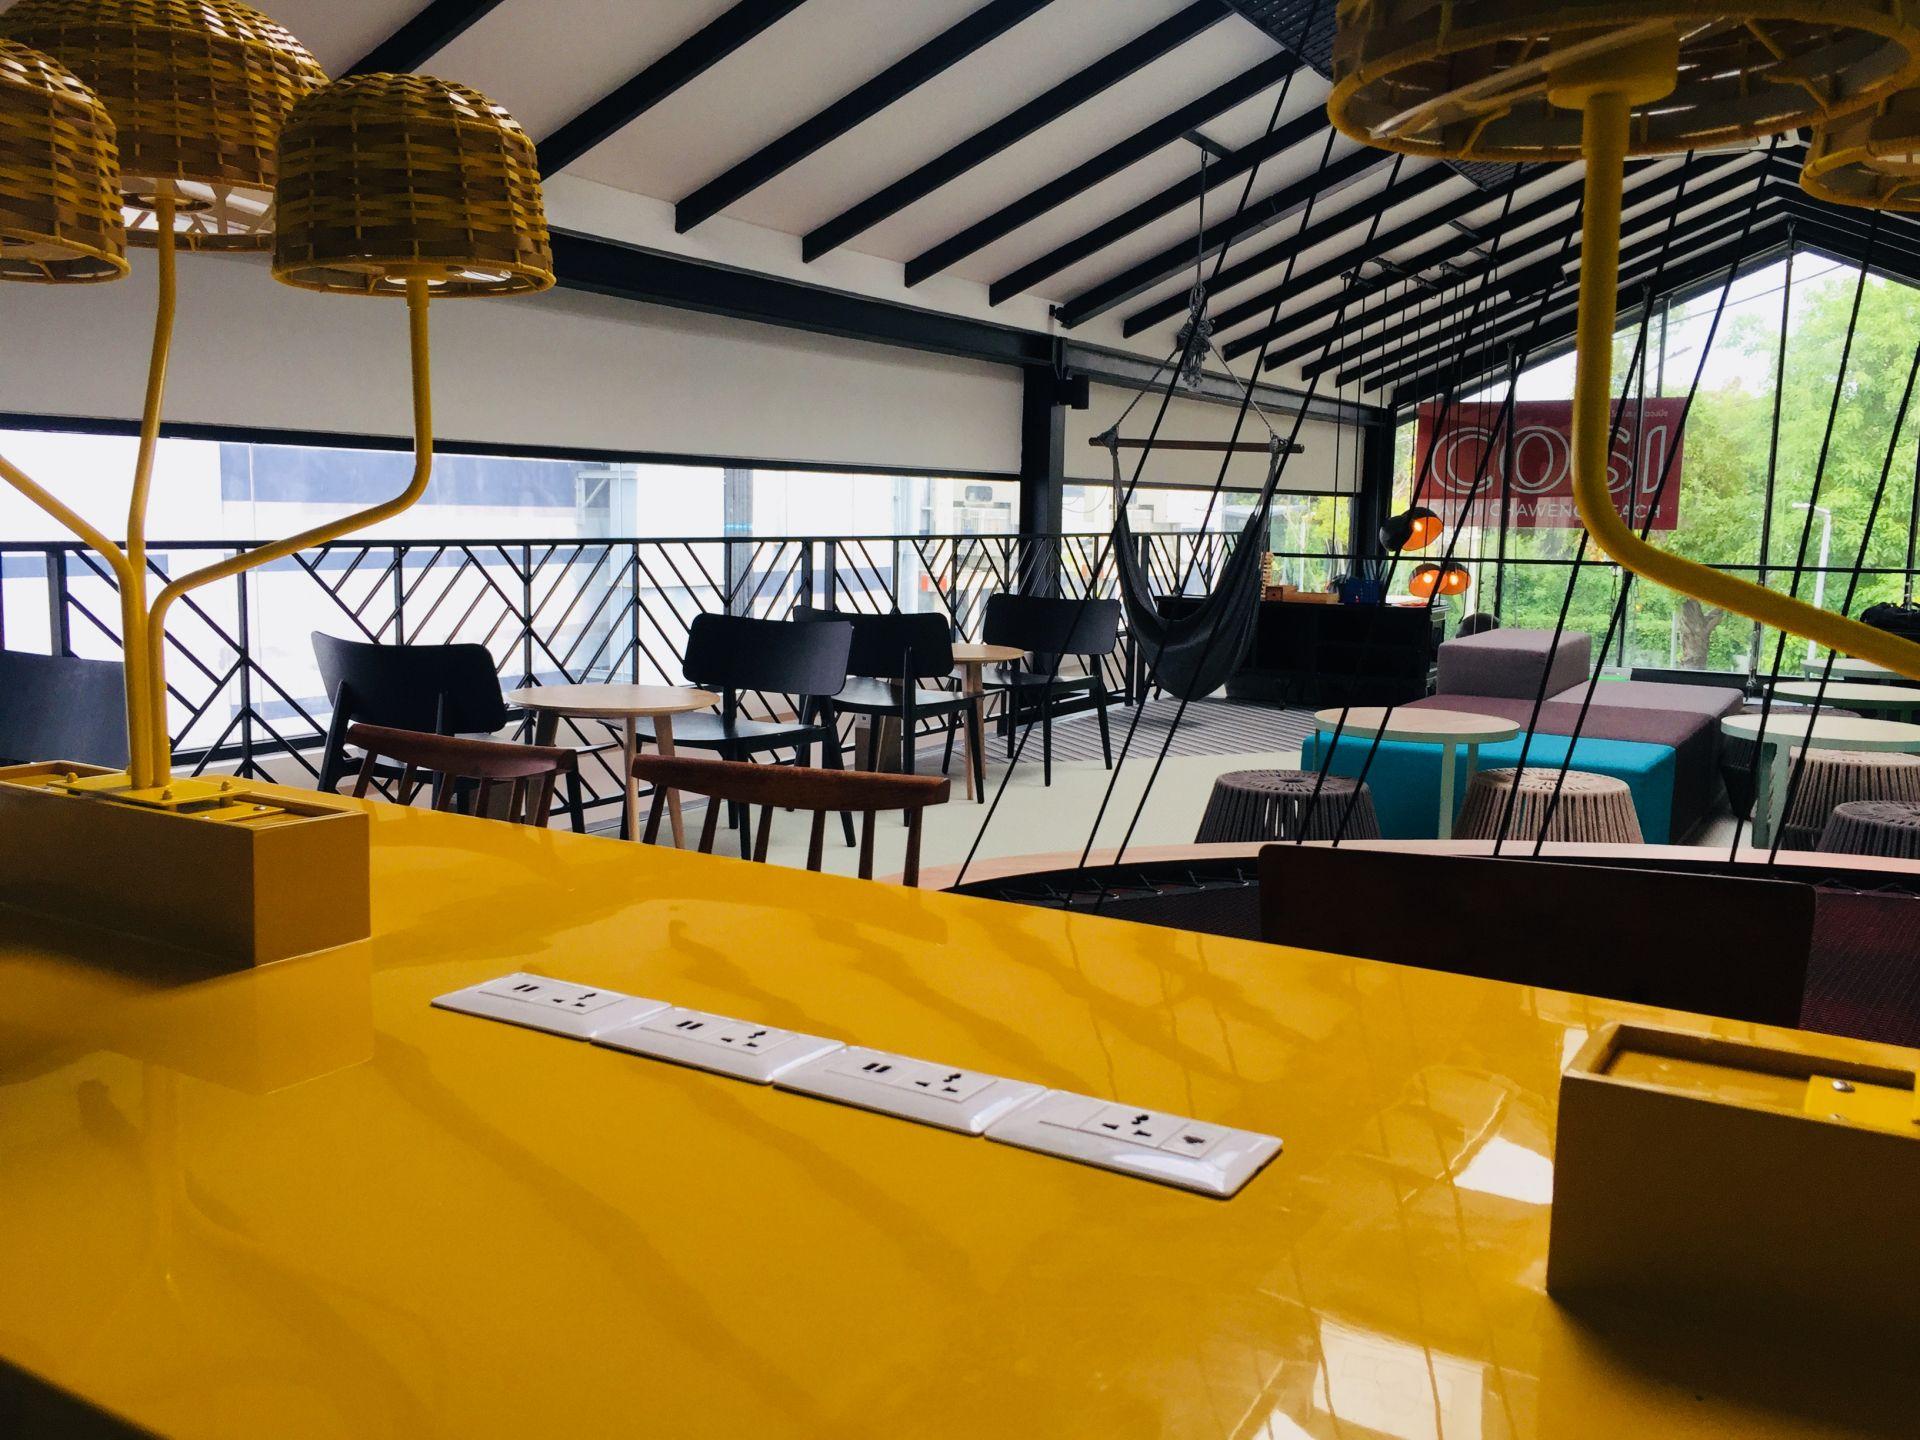 WYSIWYG Coworking Space & Cafe, Koh Samui